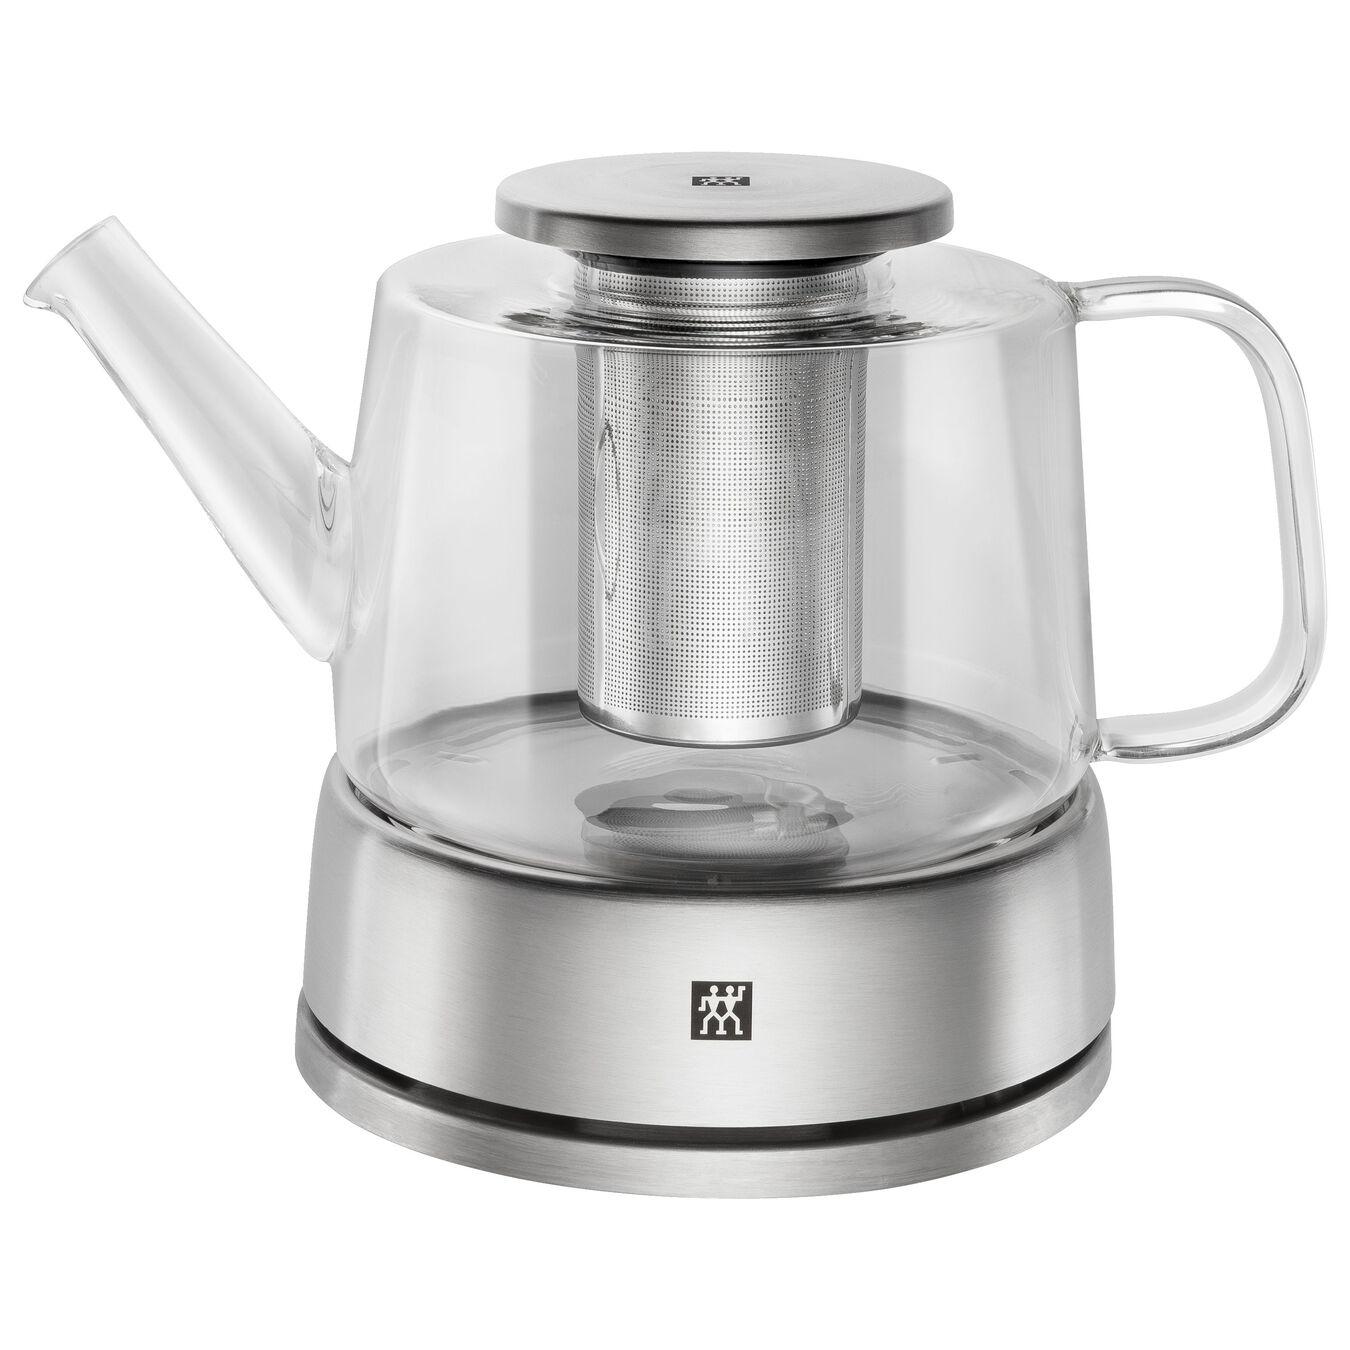 Tee-/Kaffeekanne 800 ml,,large 1